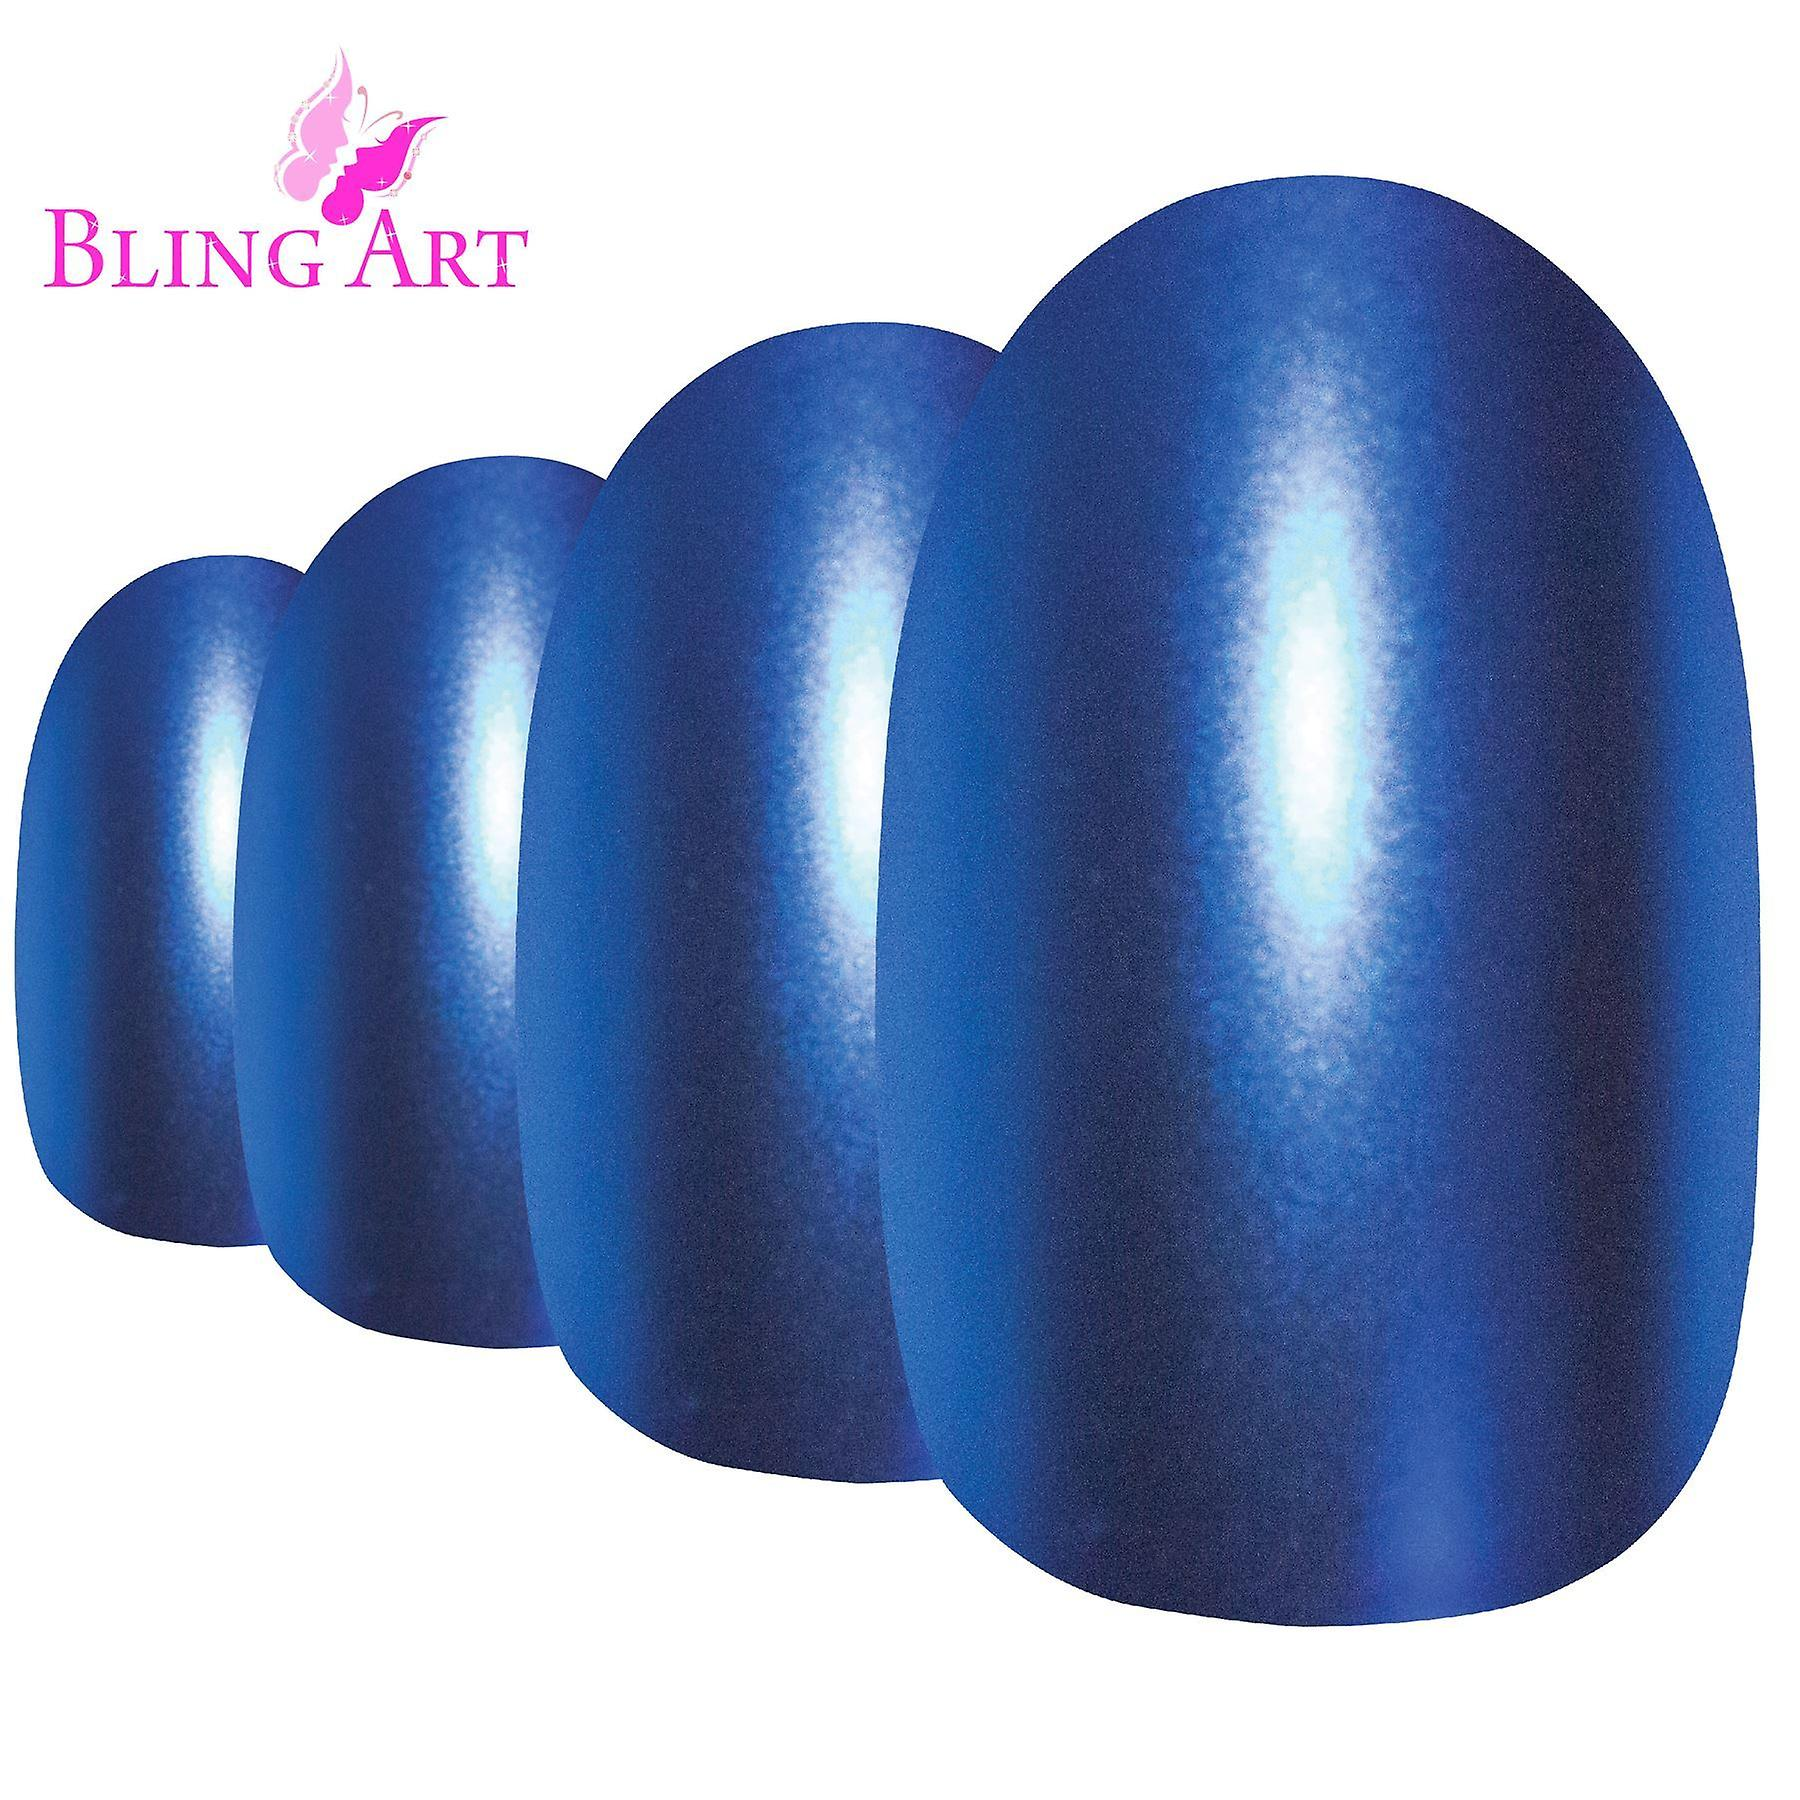 False nails by bling art blue matte metallic oval medium fake acrylic tips glue